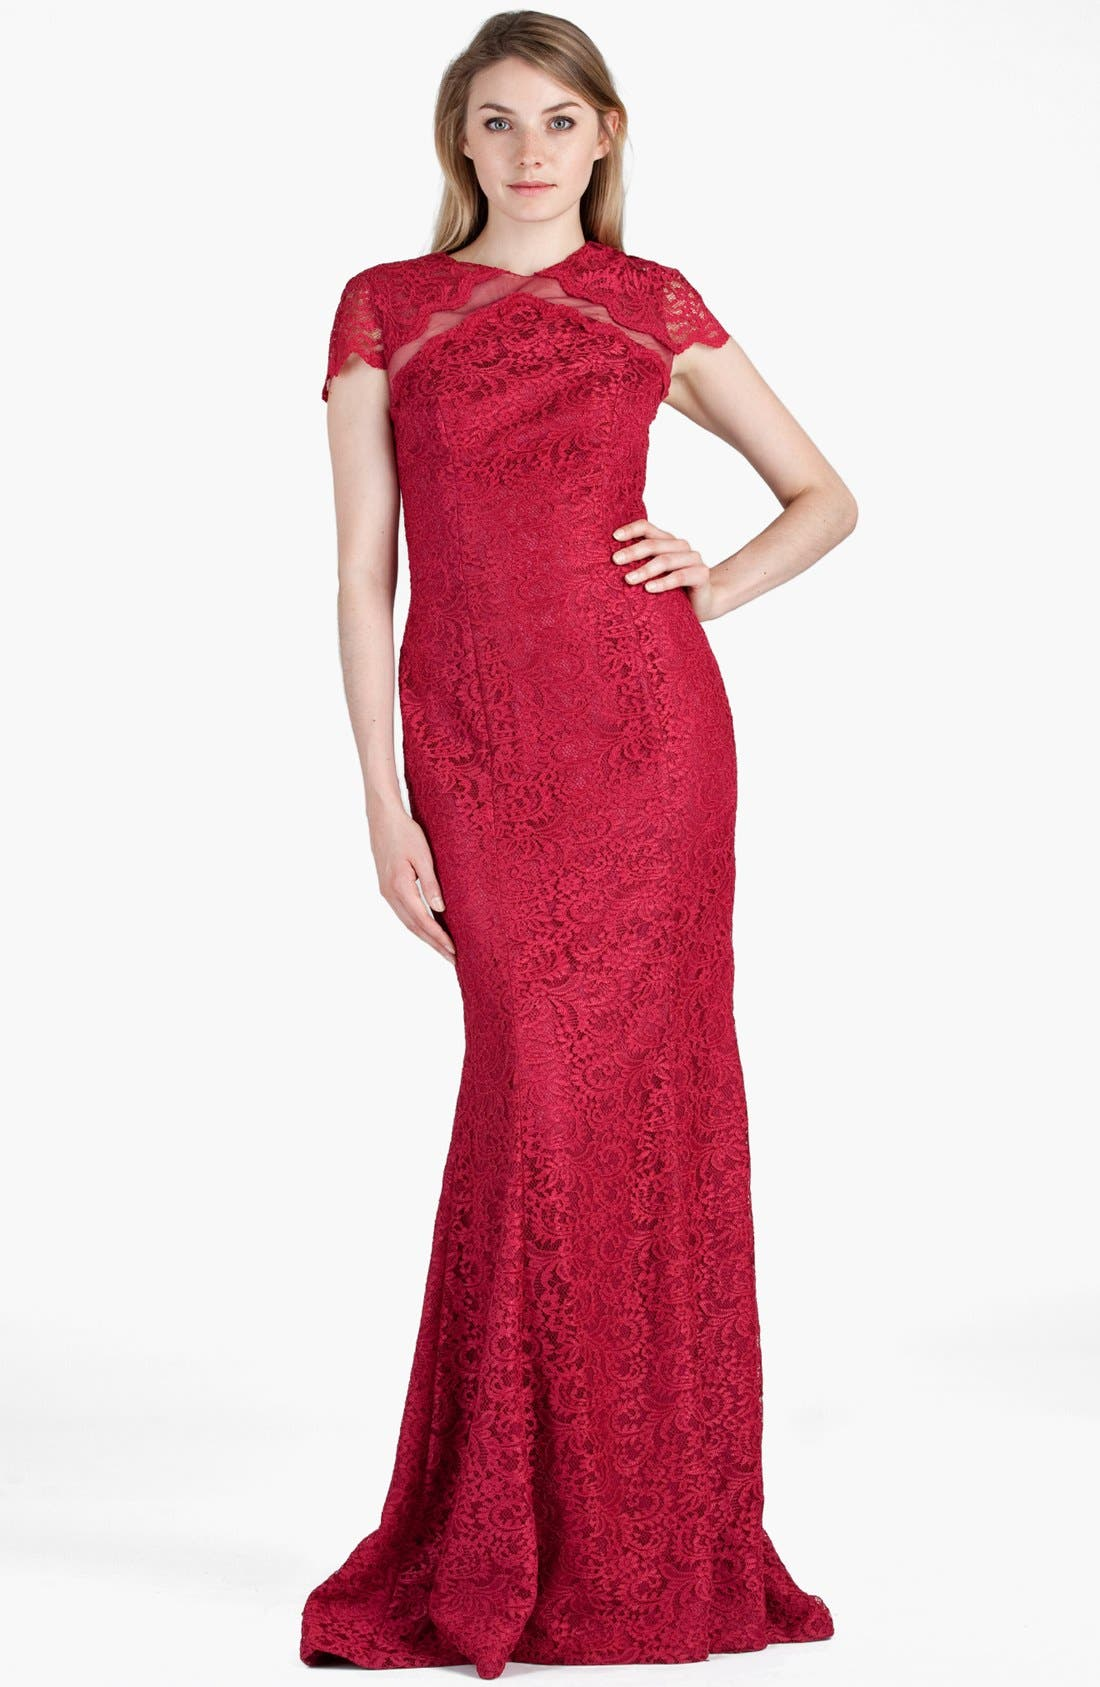 Alternate Image 1 Selected - JS Boutique Mesh Inset Lace Trumpet Gown